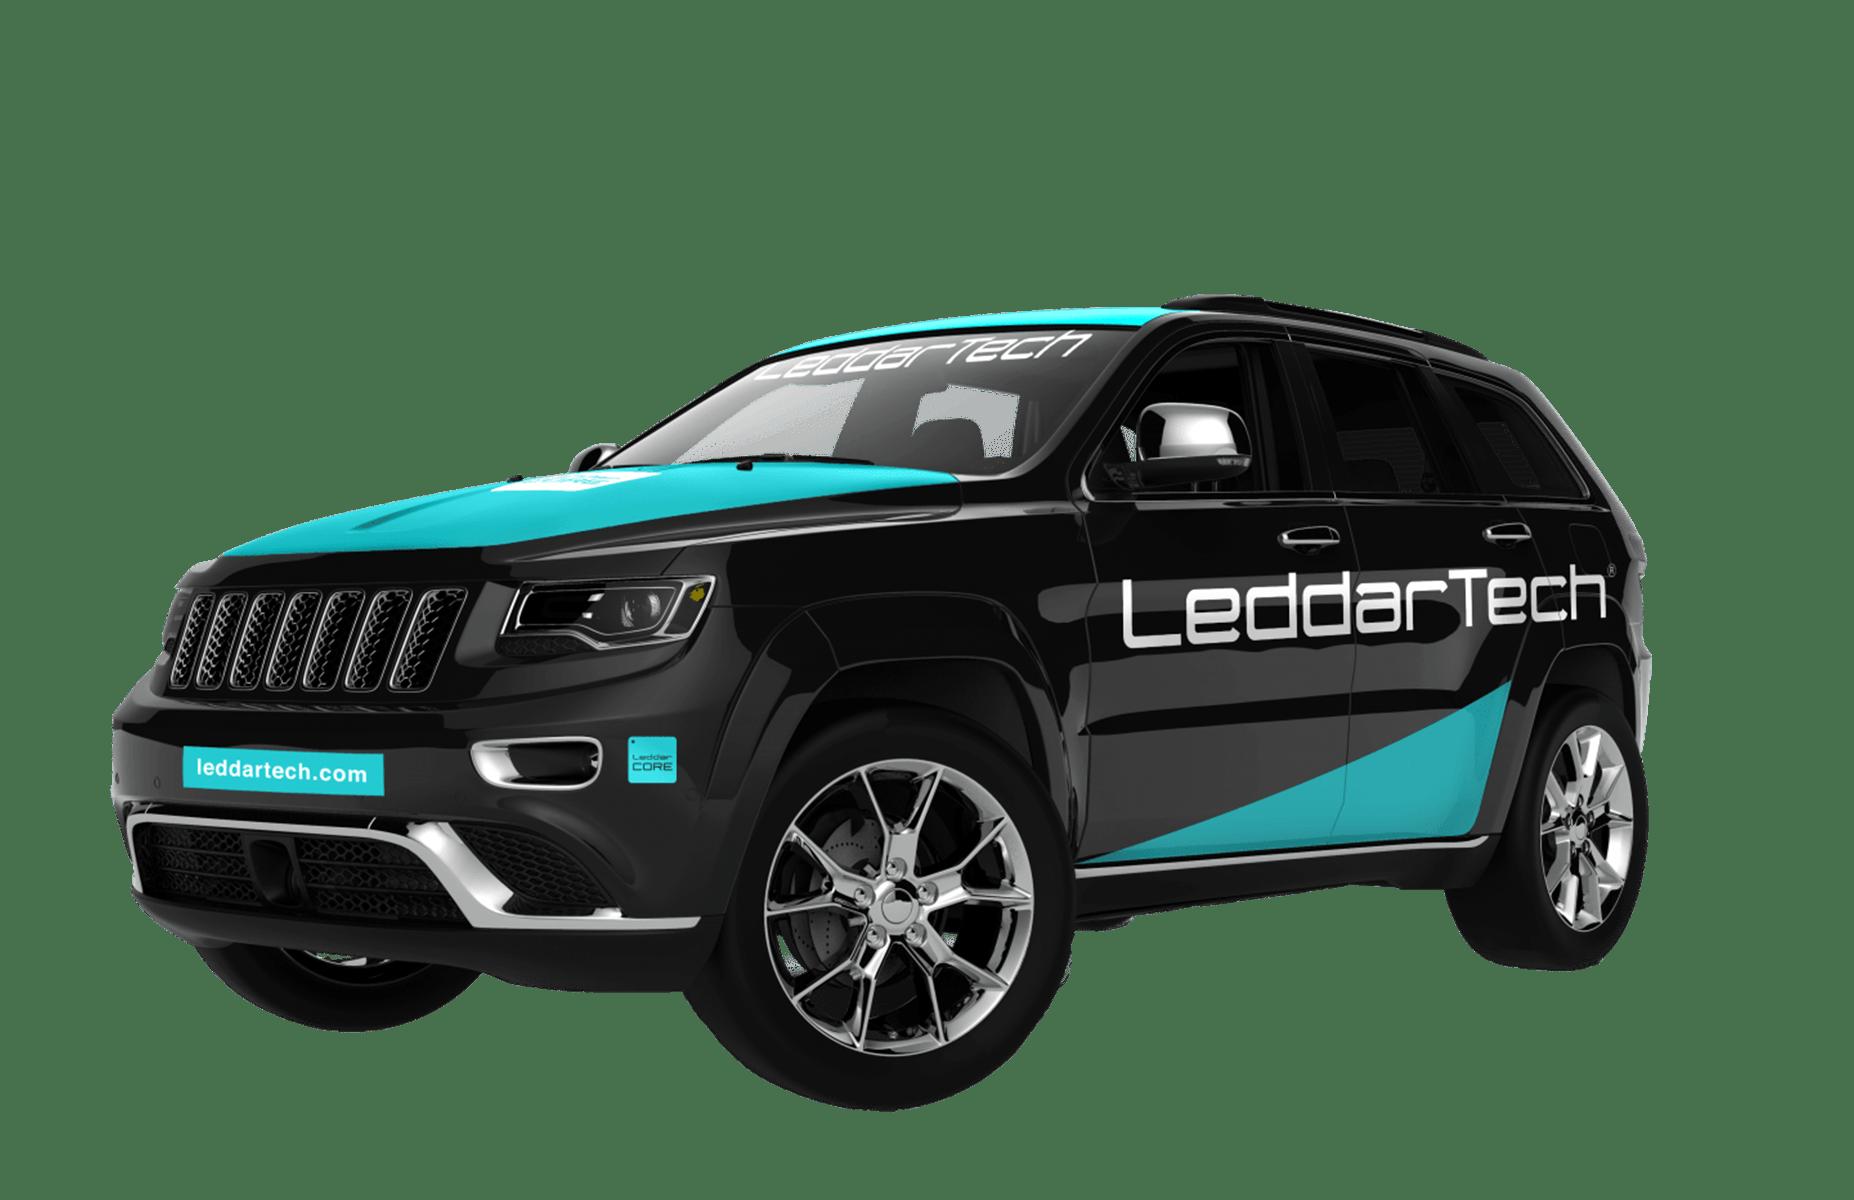 Jeep LeddarTech